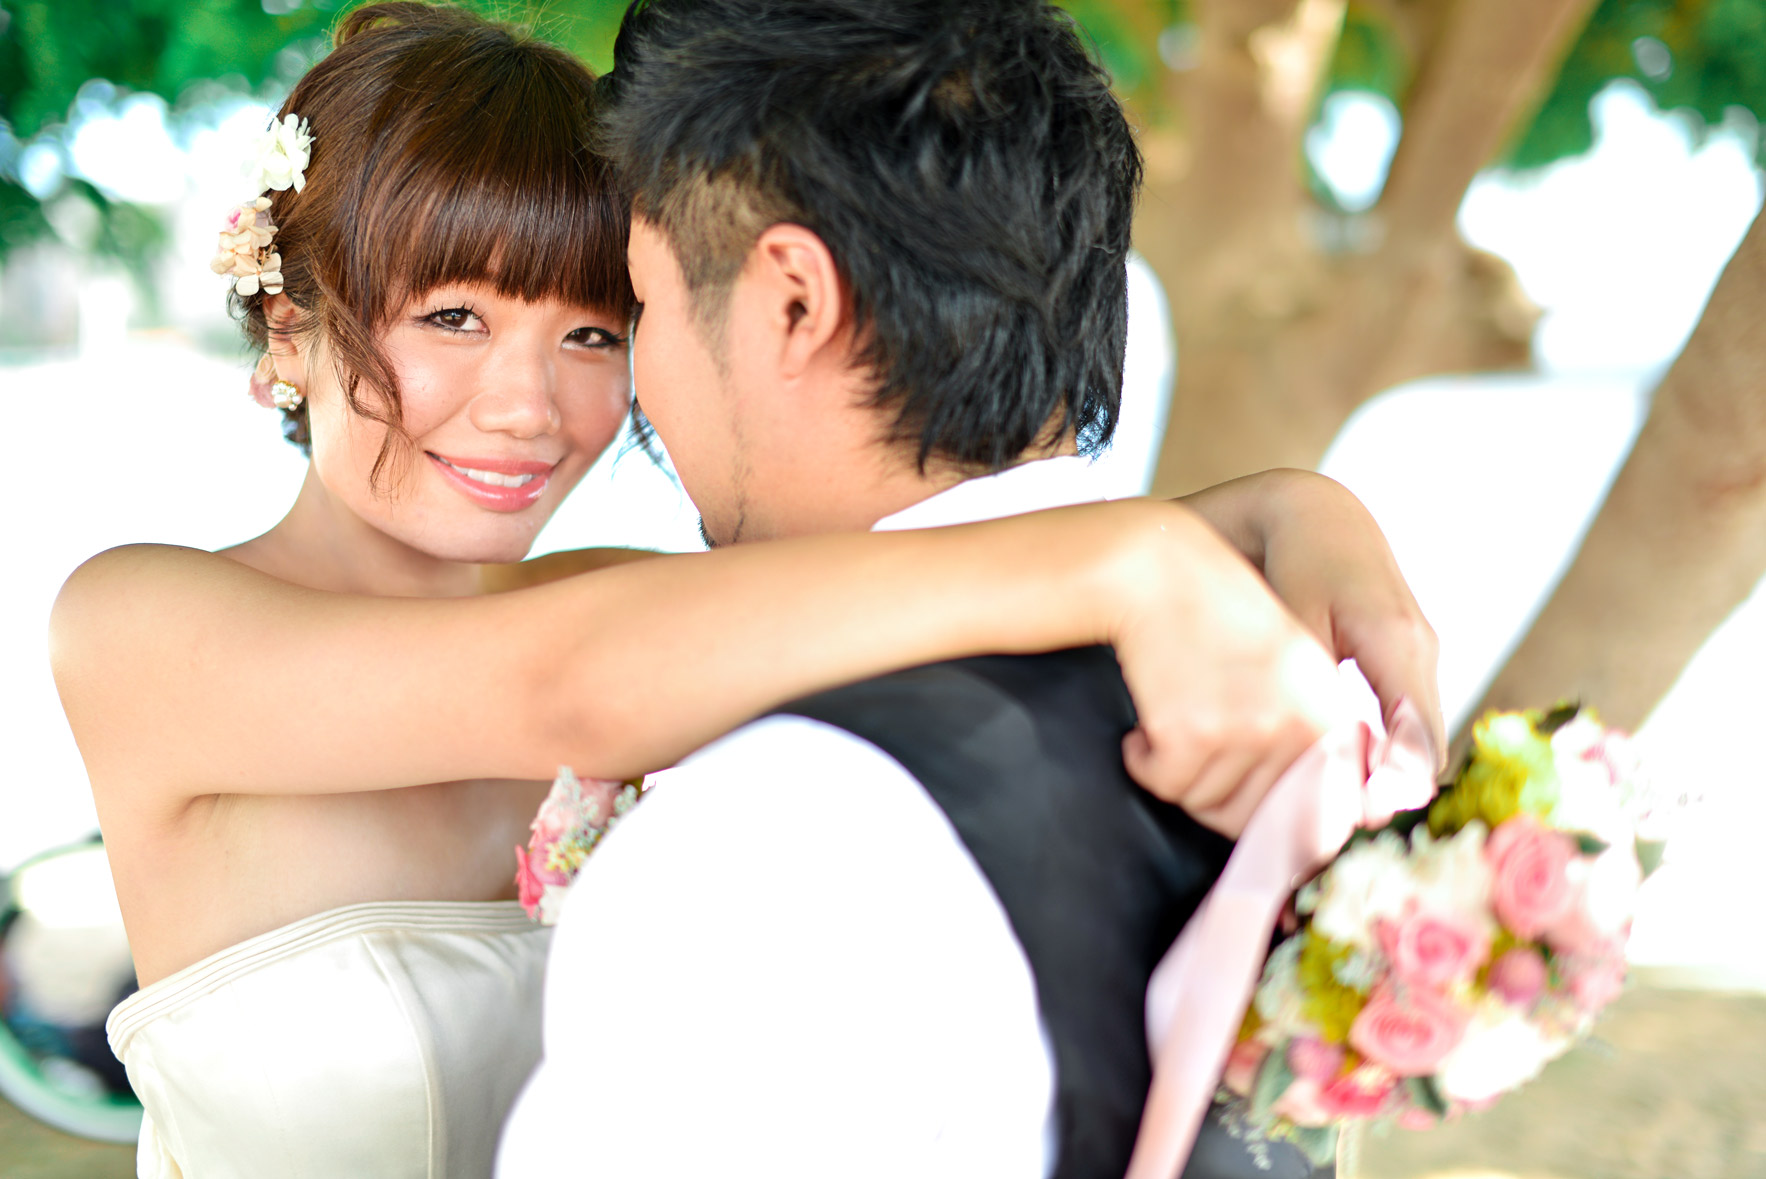 waikiki-beach-wedding-and-downtown-honolulu-hawaii-theater-stephen-ludwig-photography126.jpg